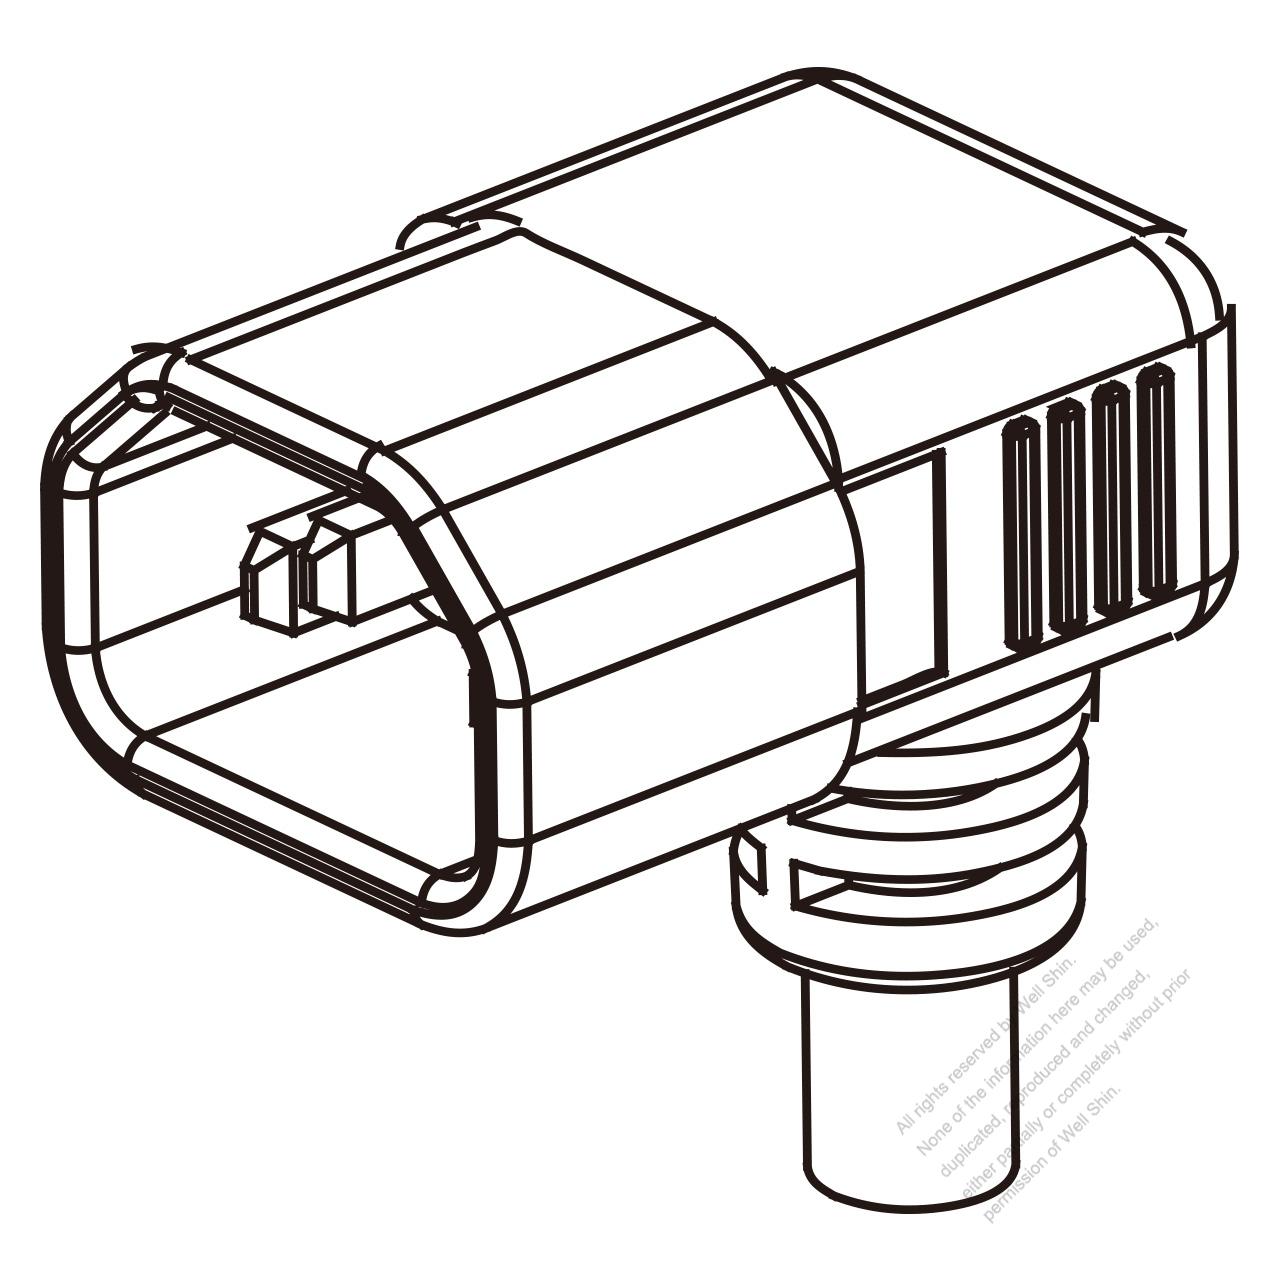 UK IEC 320 Sheet E (C14) Plug Connectors 3-Pin Angle 10A